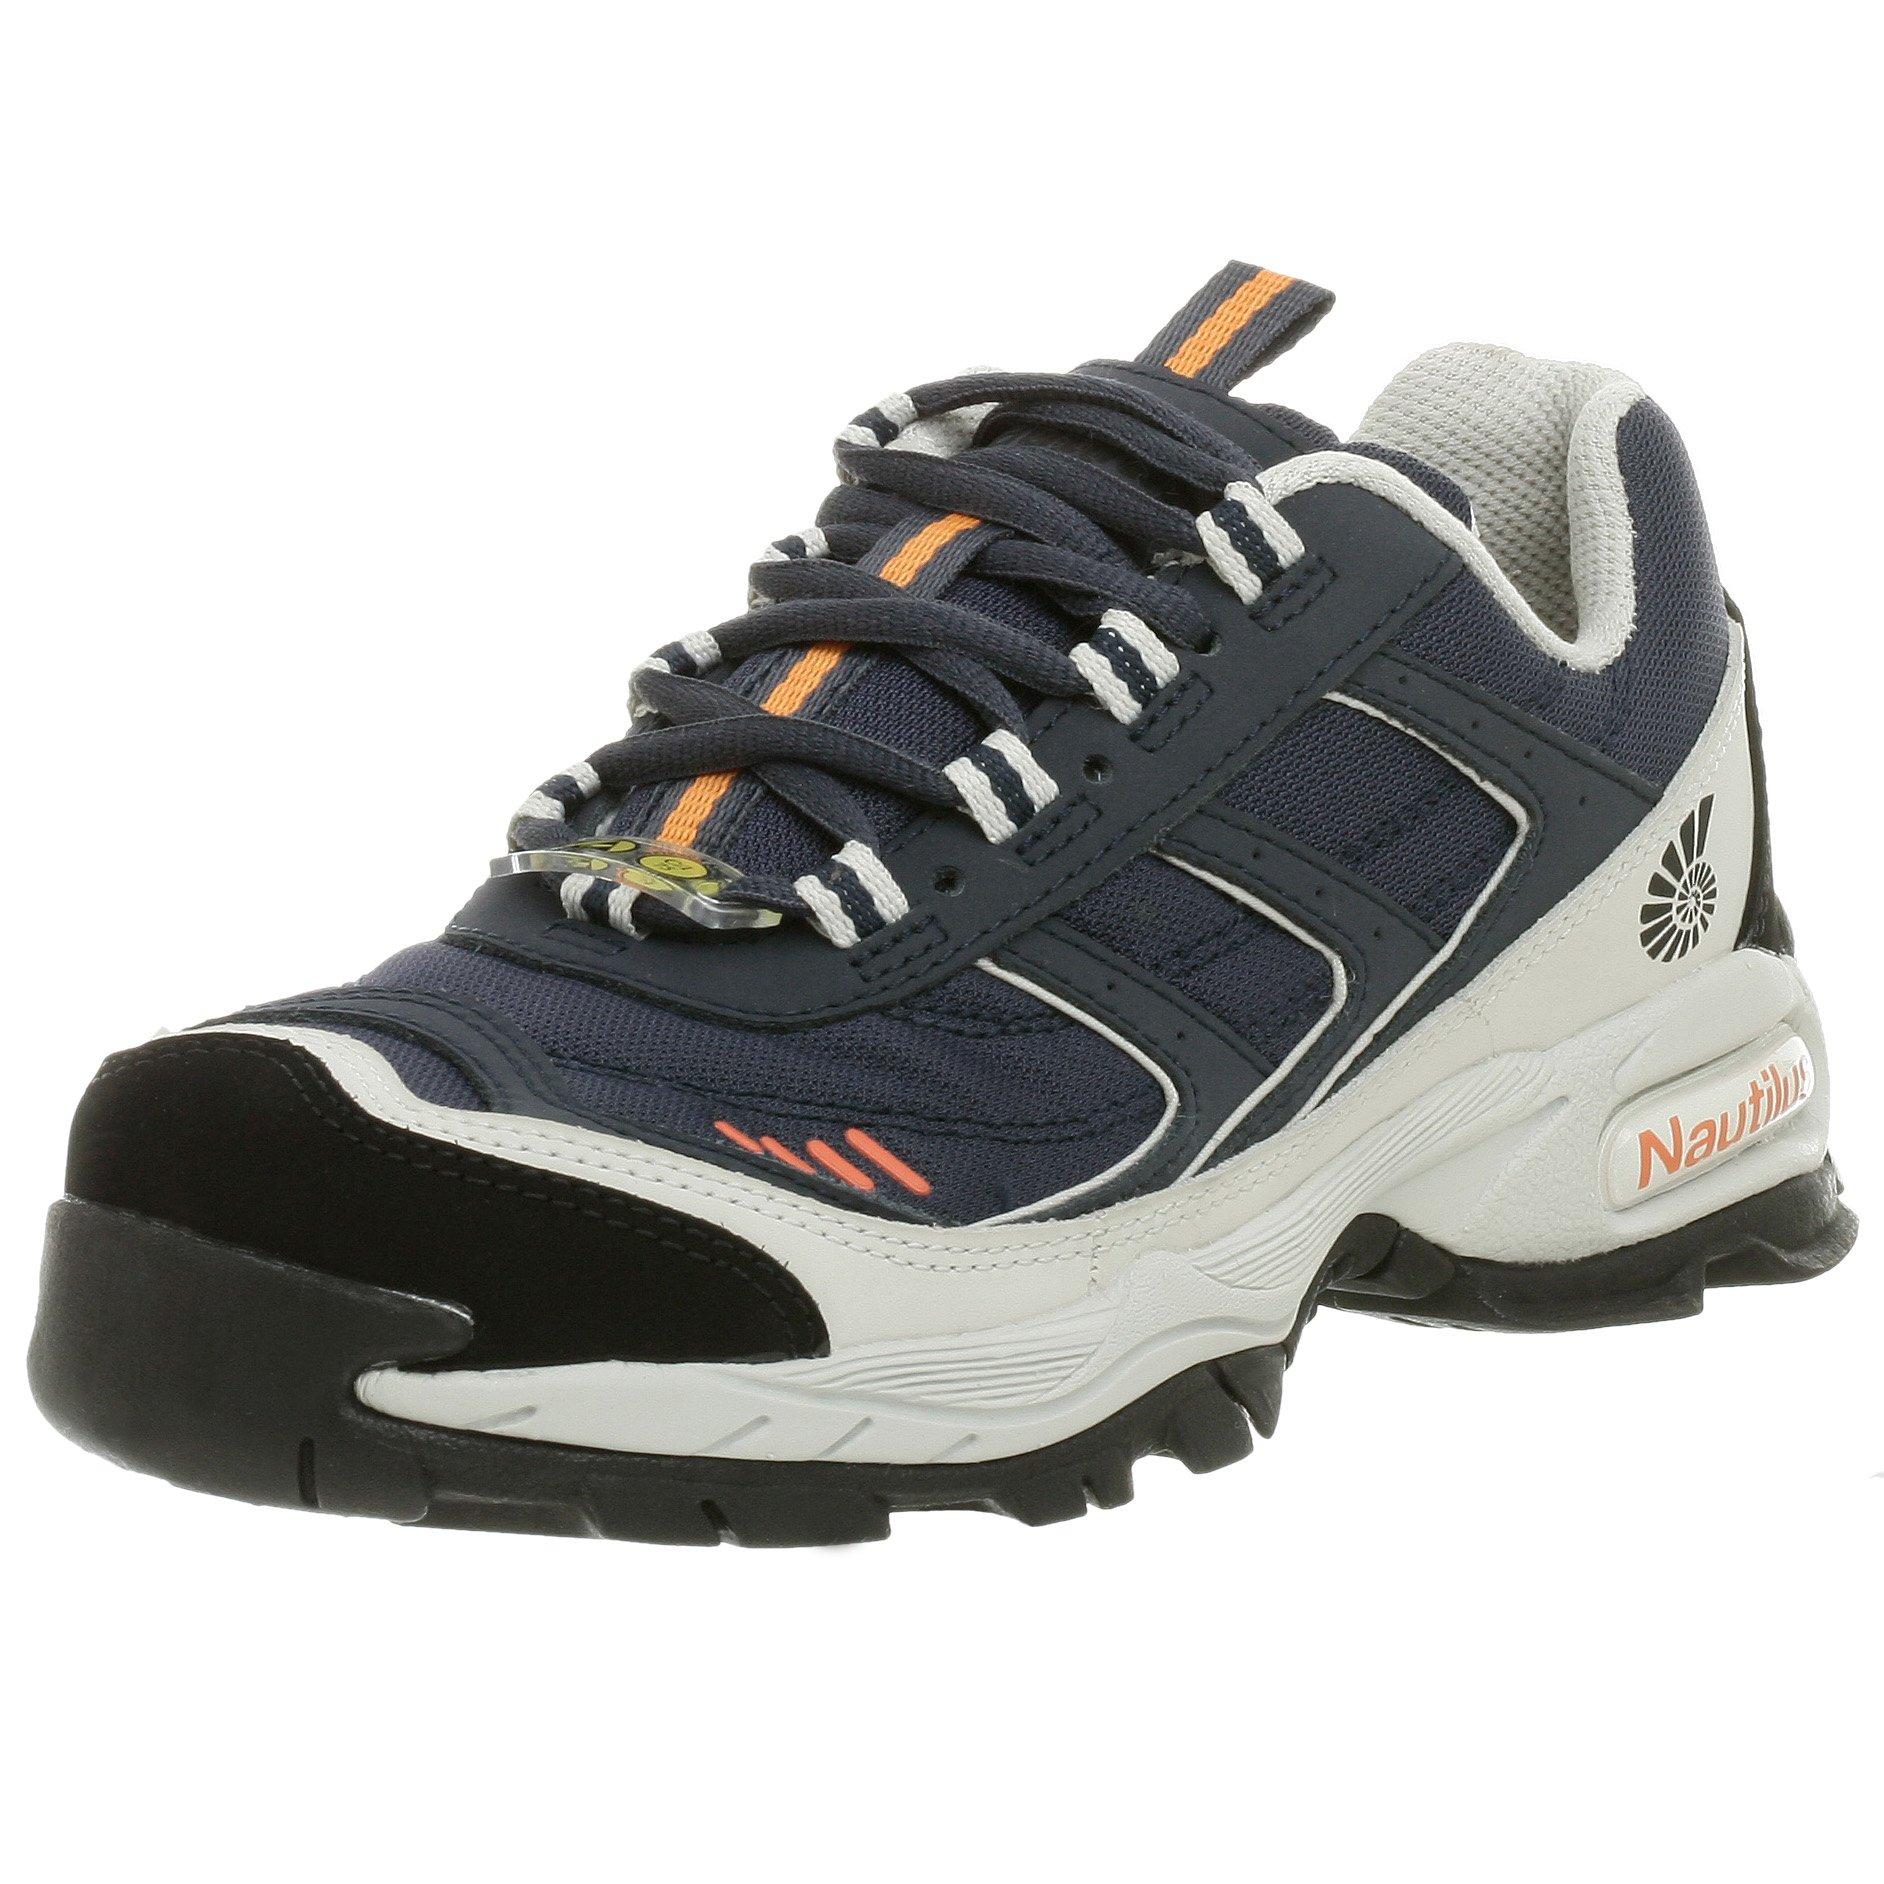 Nautilus Womens Black Leather//PU Comp Toe Waterproof EH Work Shoes 6 W